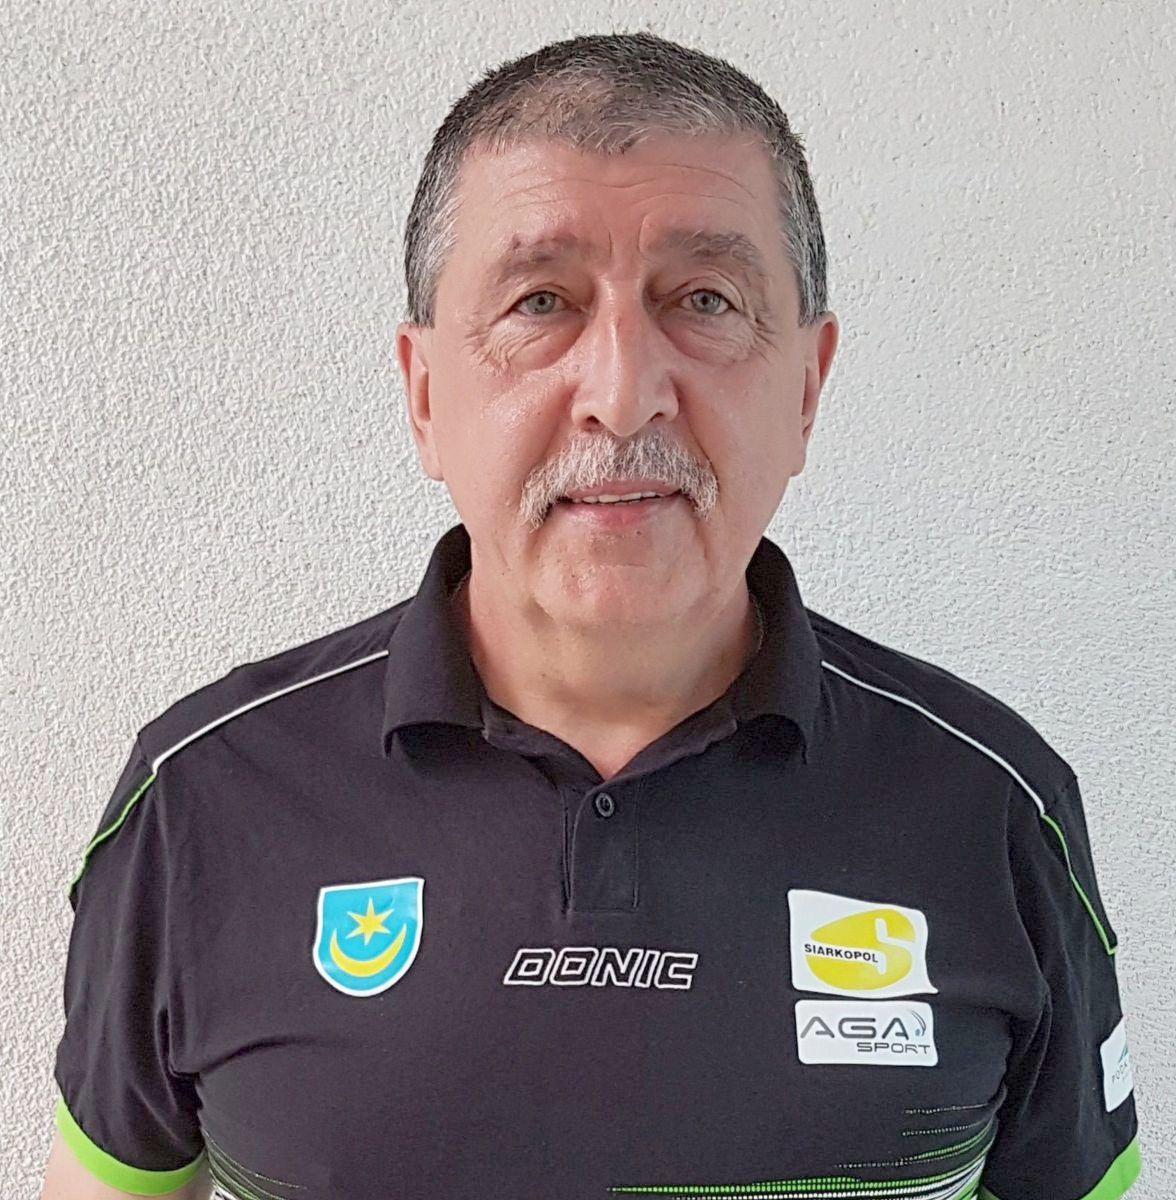 Antoni Biedziuk